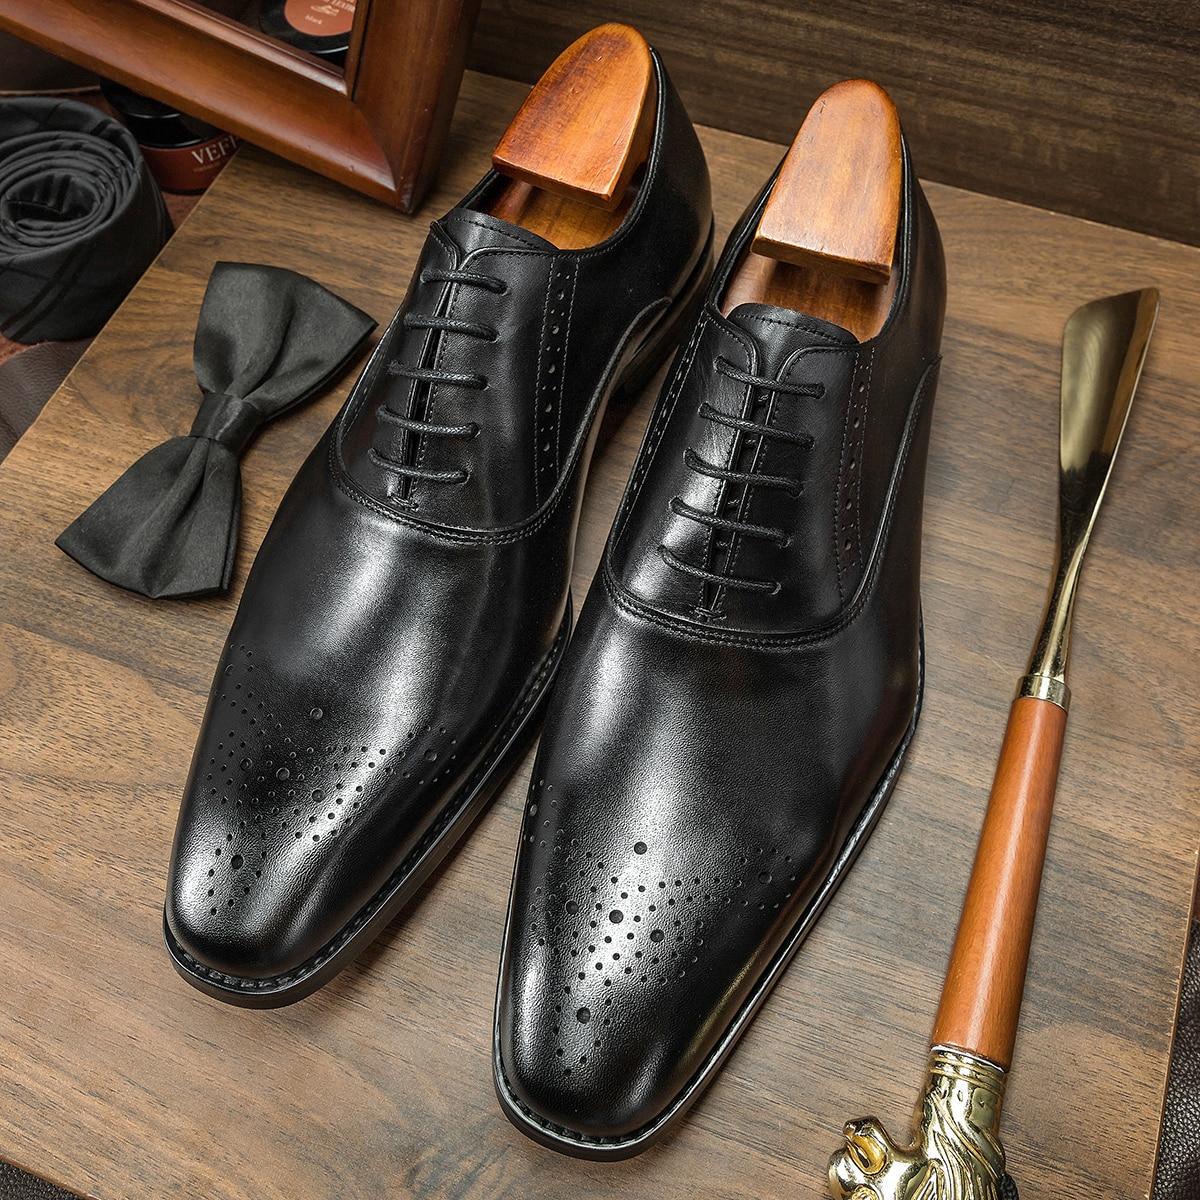 Hanmce الرجال الفاخرة أكسفورد فستان الزفاف أحذية من الجلد الحقيقي